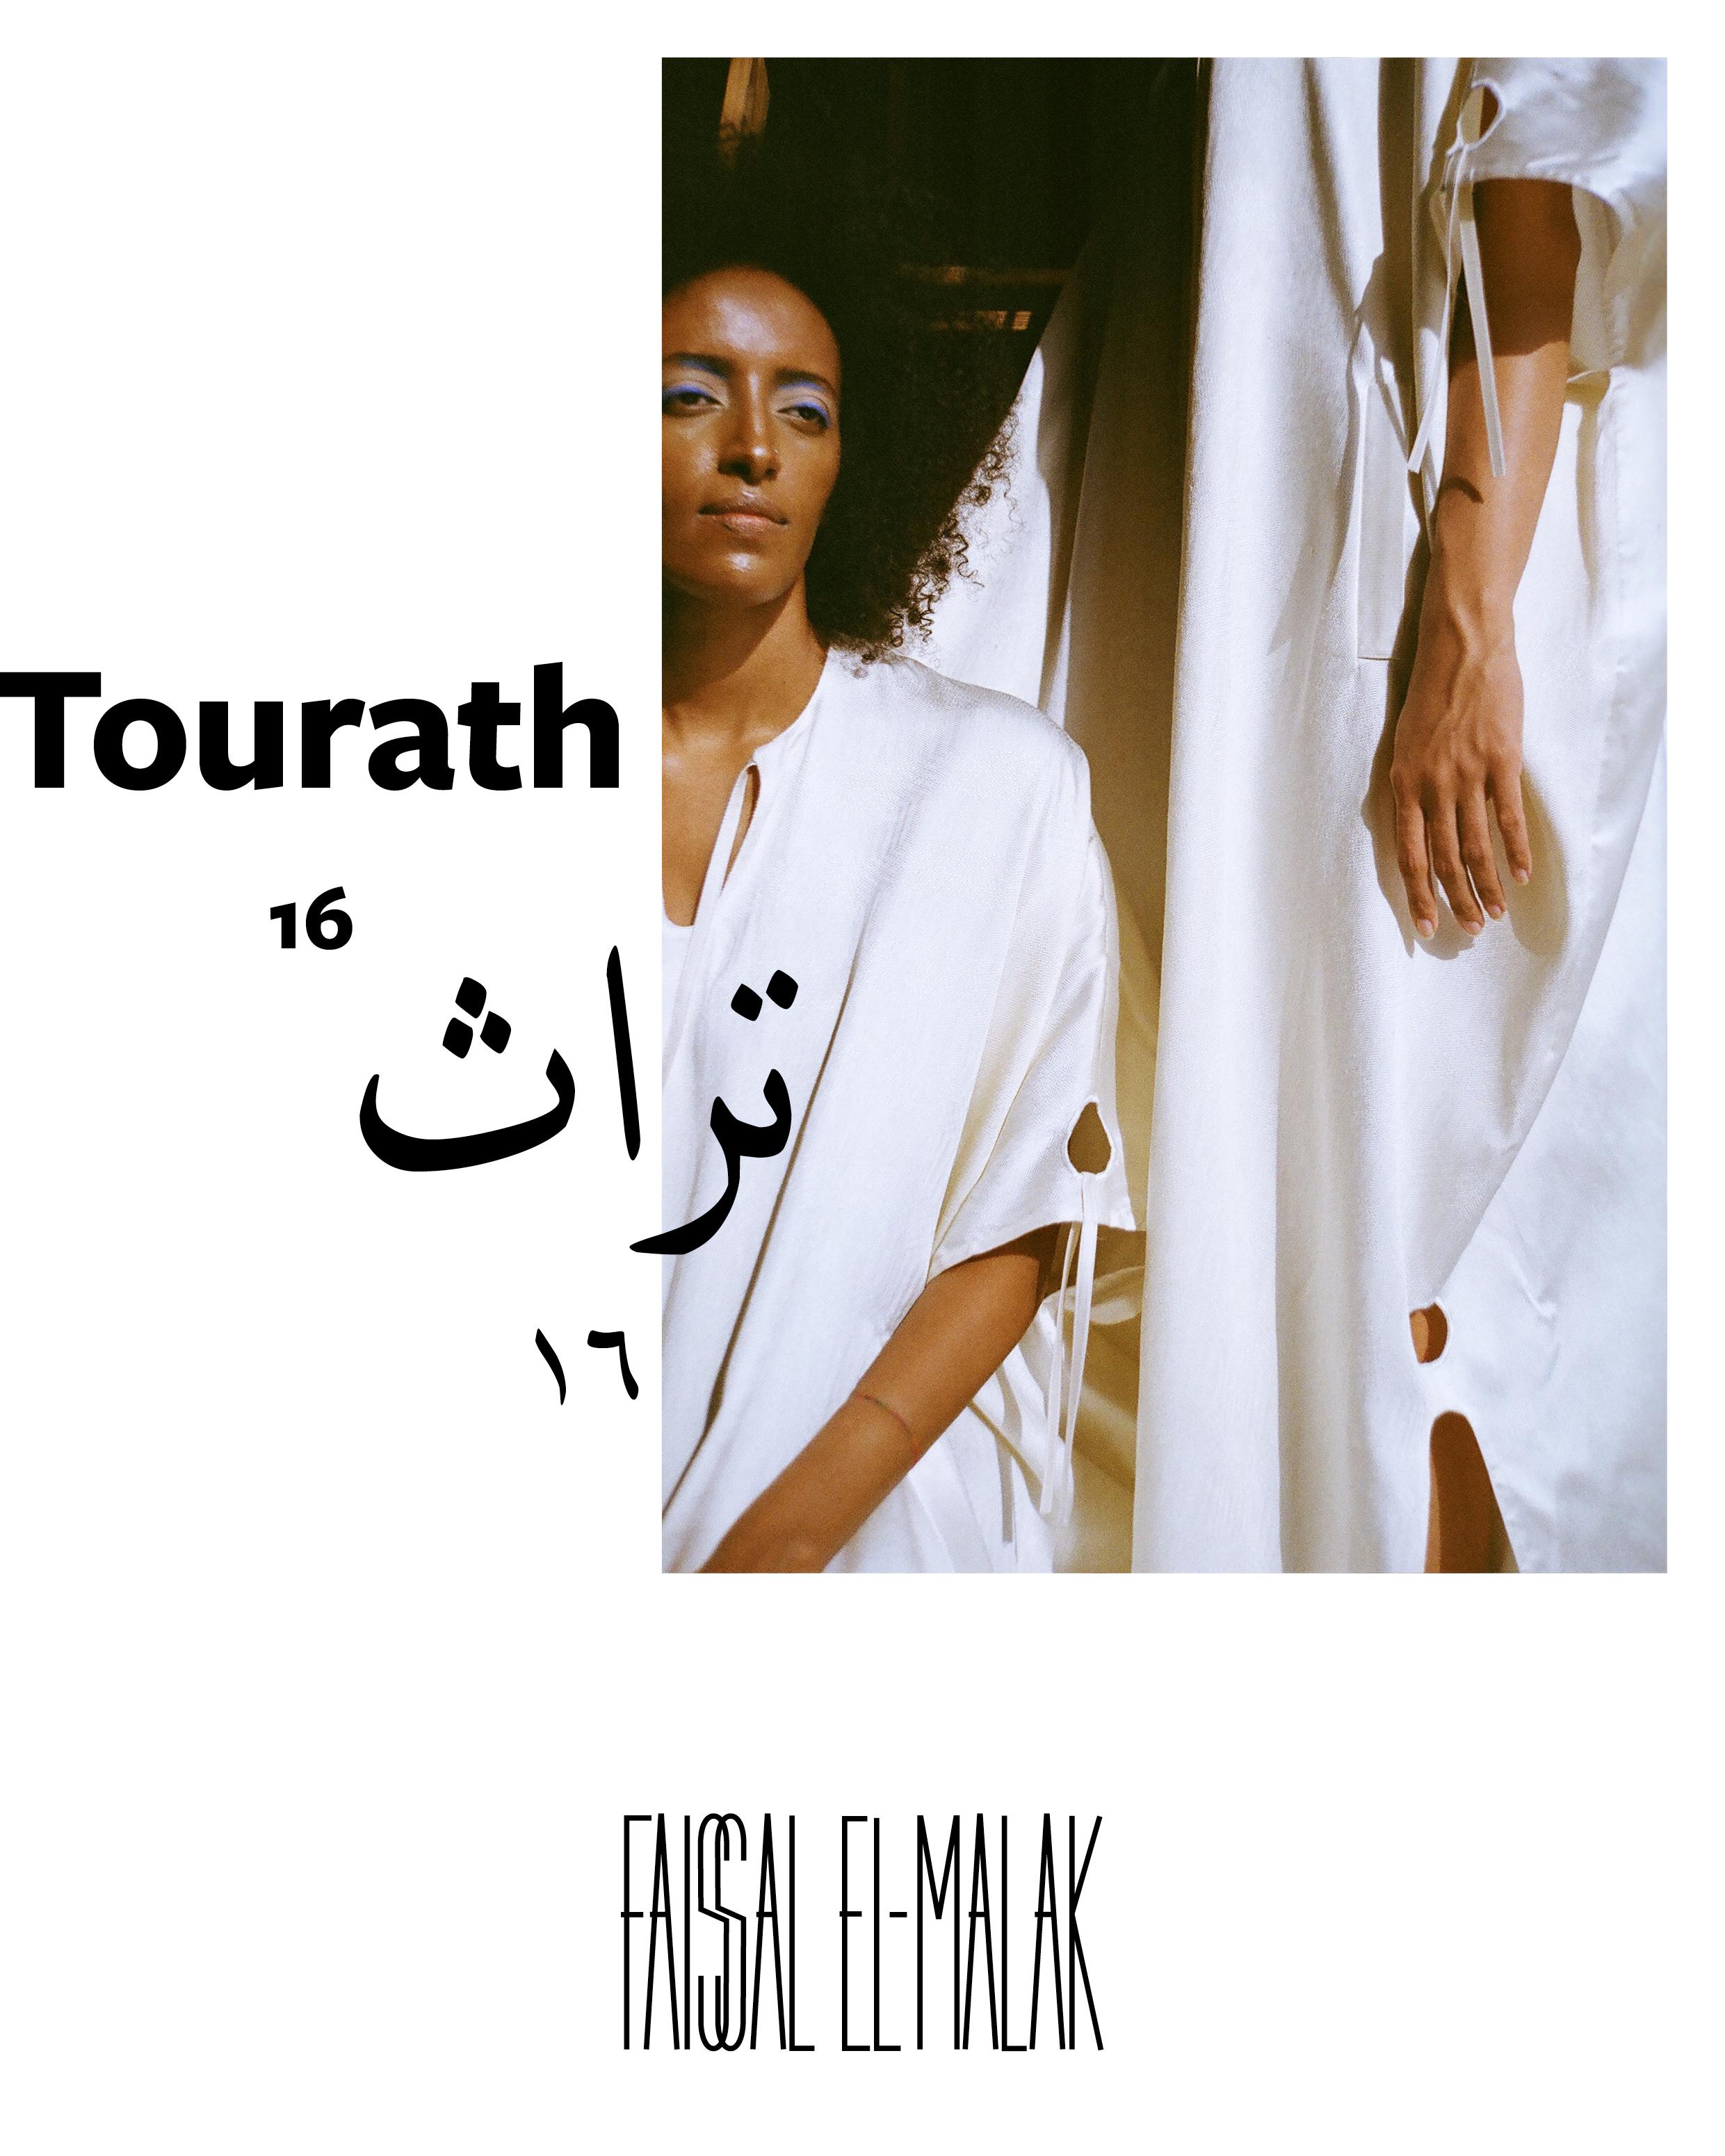 Faissal El-Malak Tourath 16 web lookbook RGB